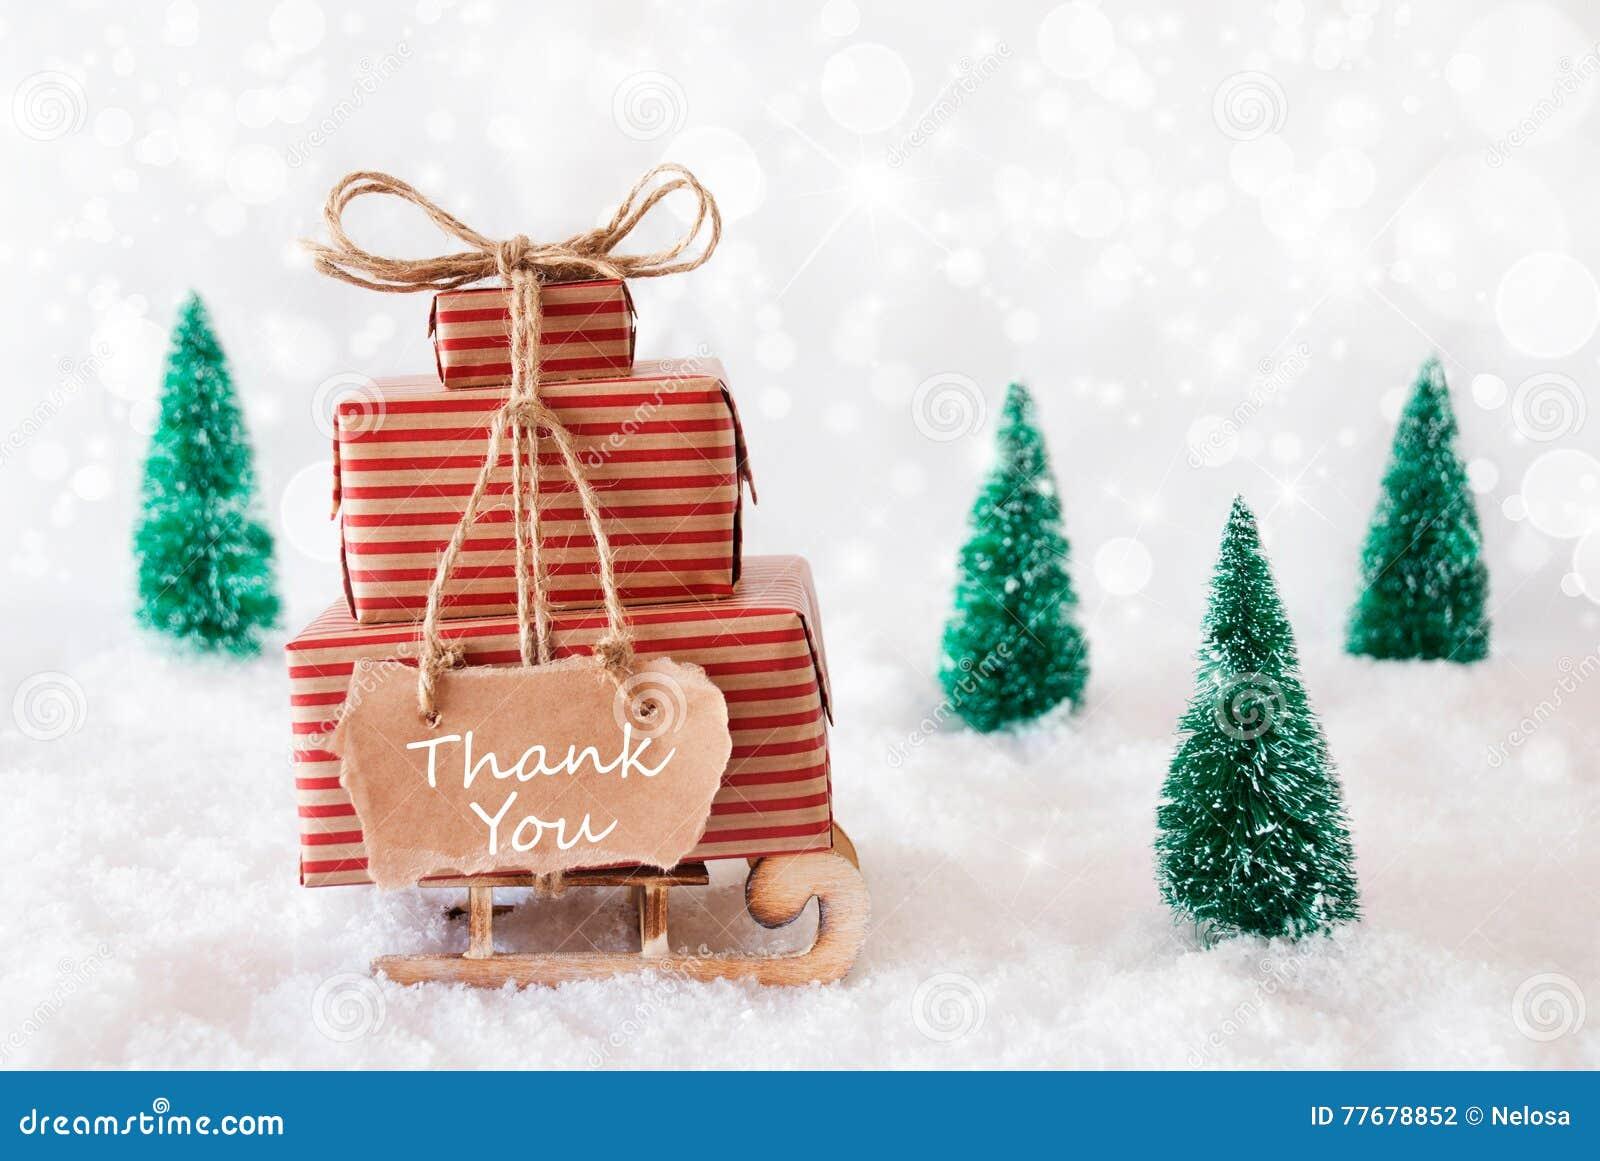 Christmas Sleigh On Snow, Thank You Stock Photo - Image of gift ...